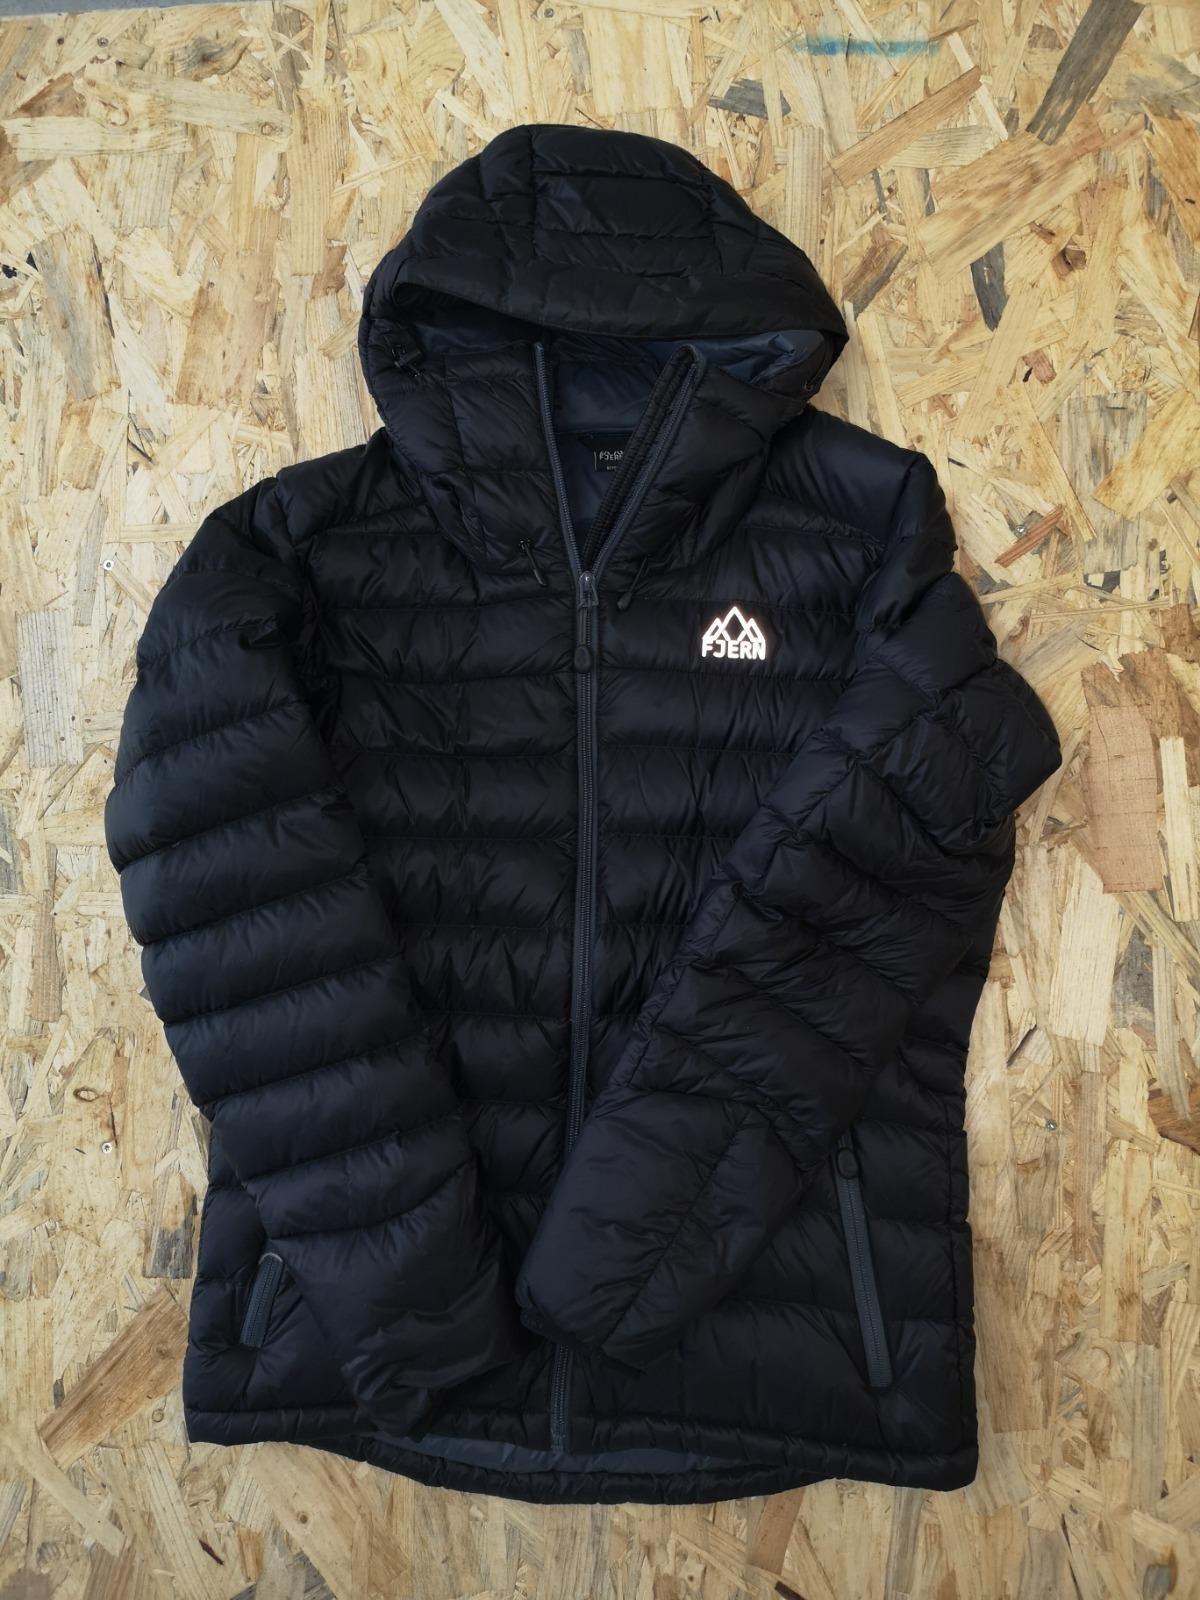 Fjern Down Jacket Black